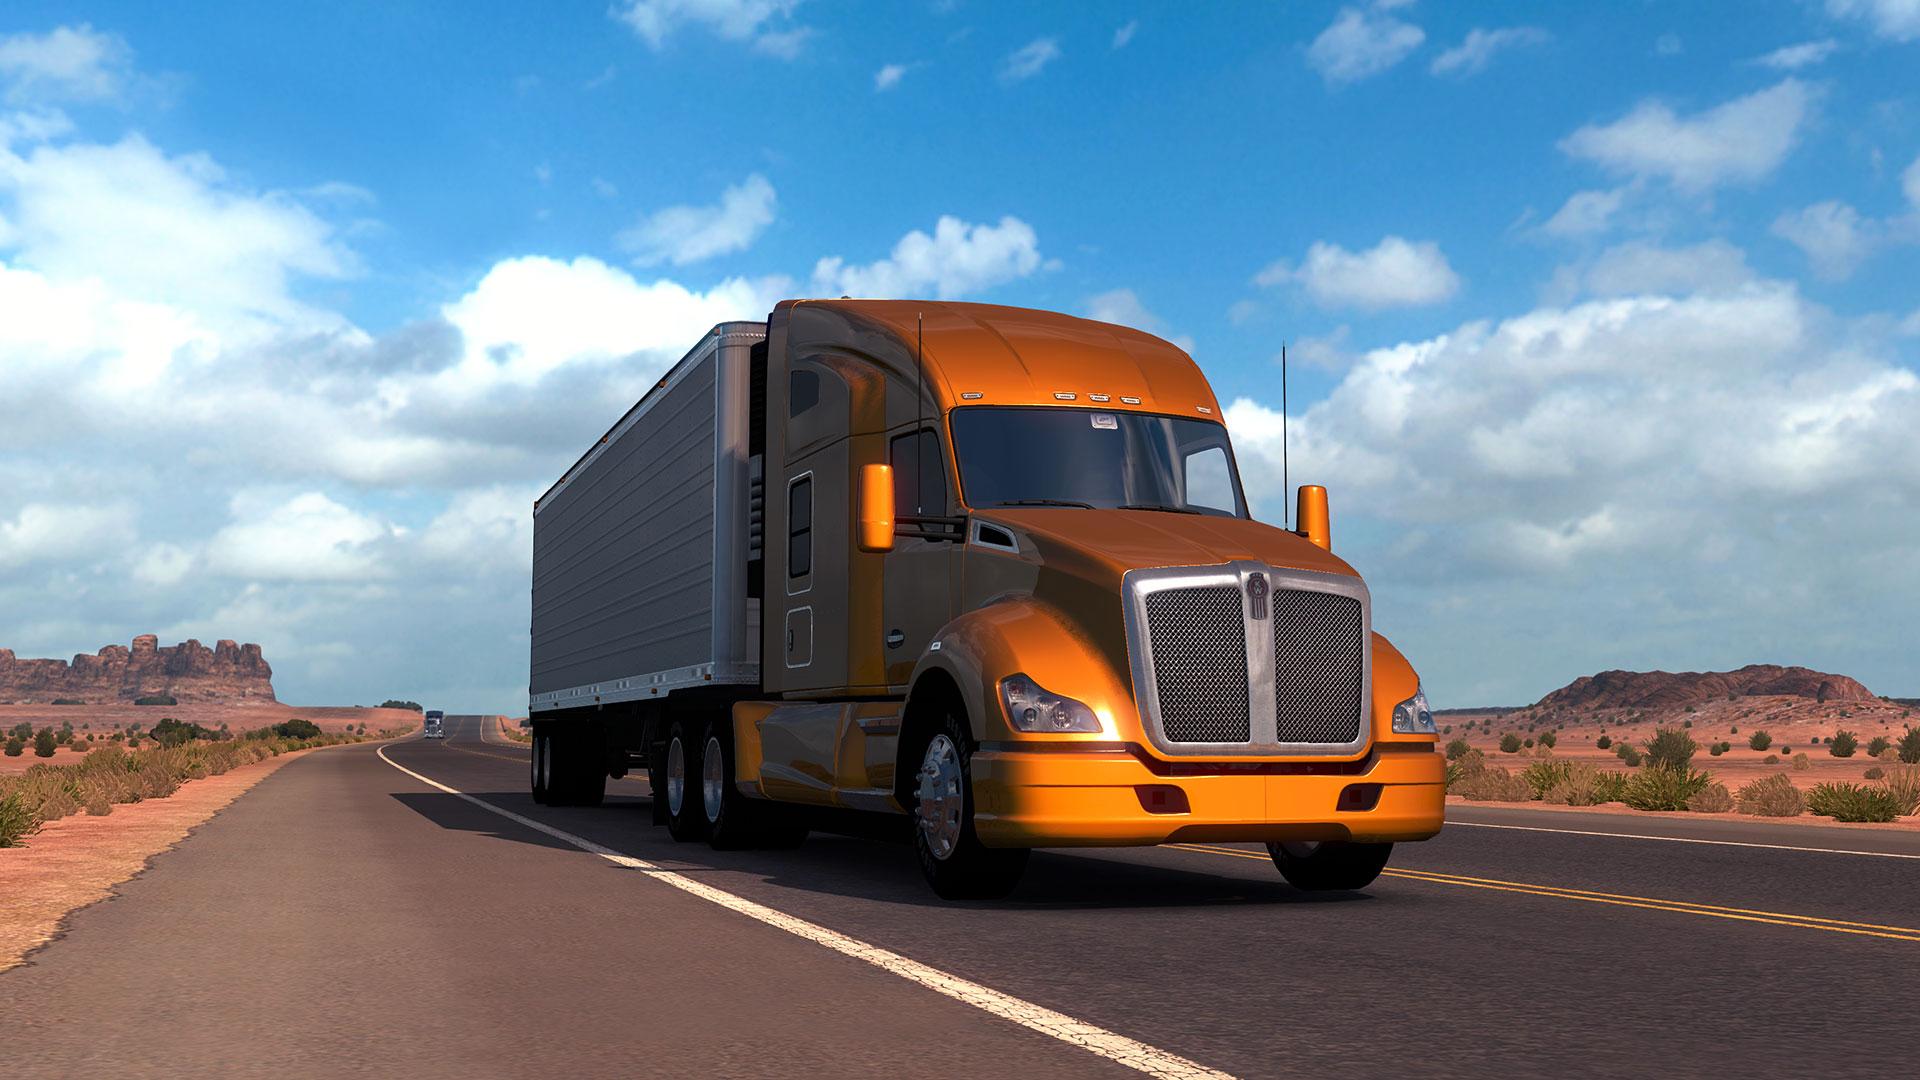 美国卡车模拟 VR (American Truck Simulator)插图